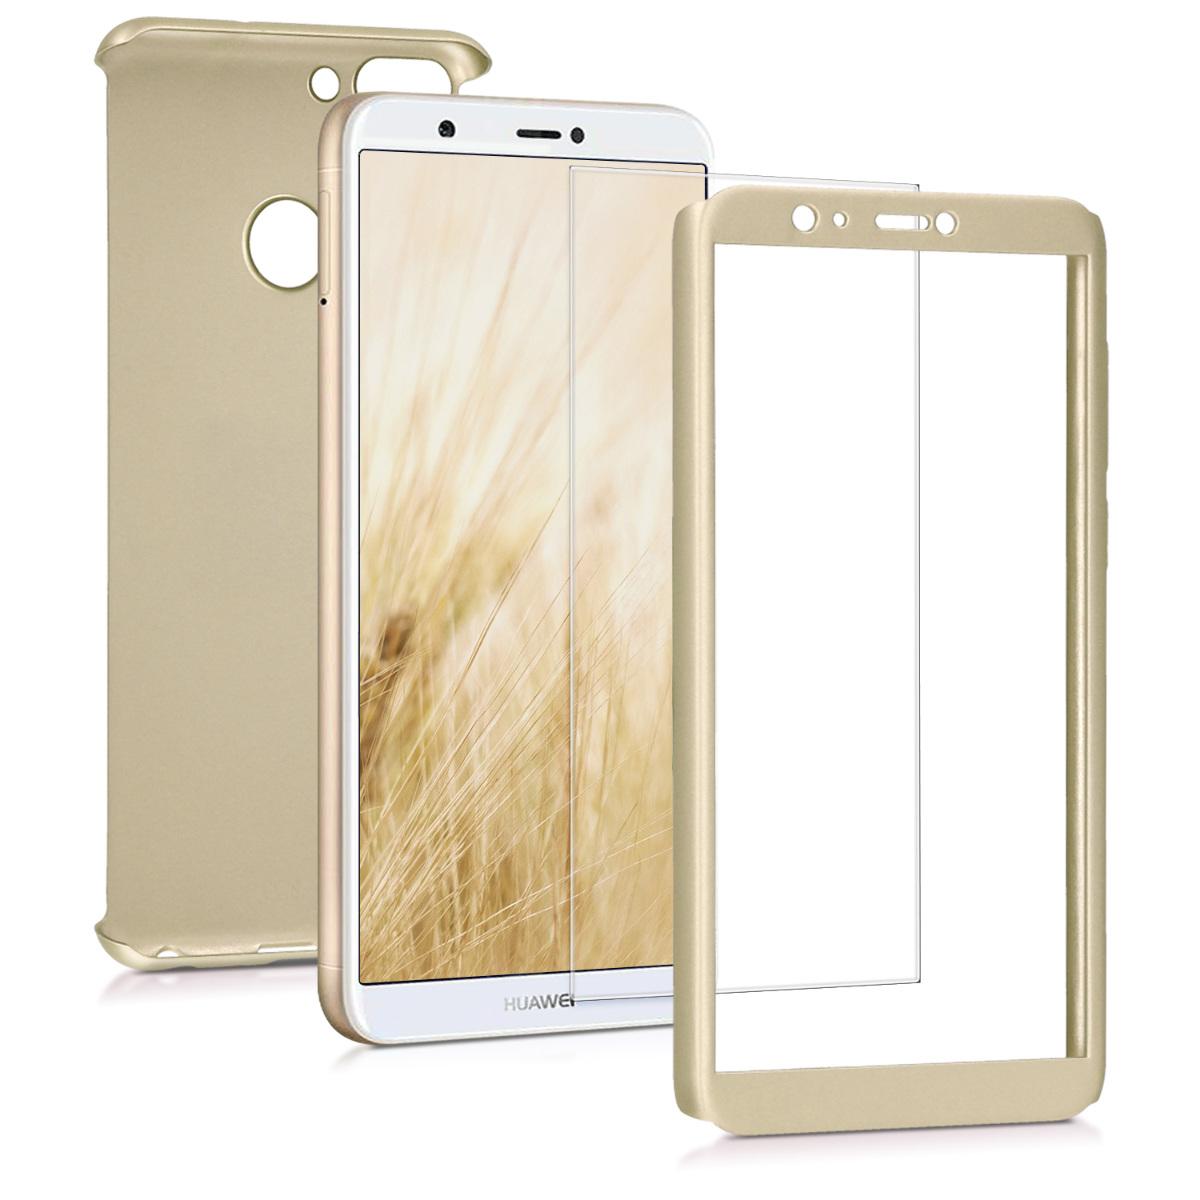 KW Θήκη Full Body Huawei Enjoy 7S / P Smart & Tempered Glass - Metallic Gold (45559.66)